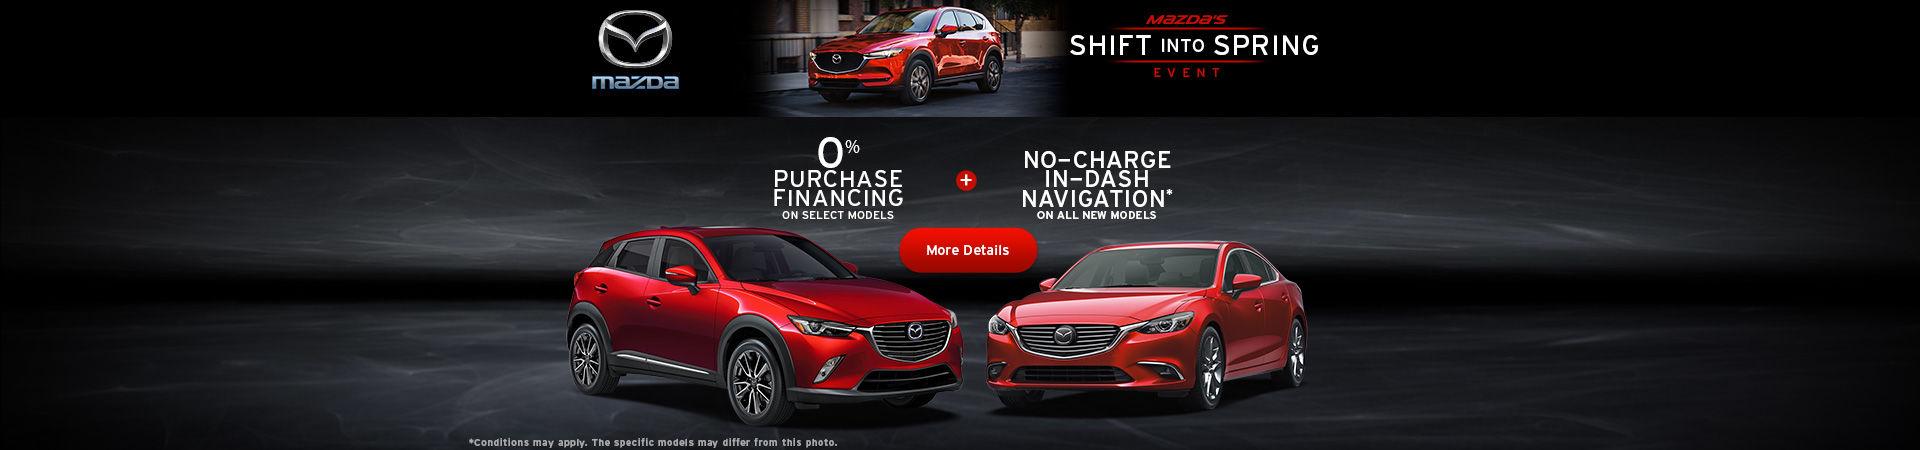 Mazda's Shift into Spring Event web